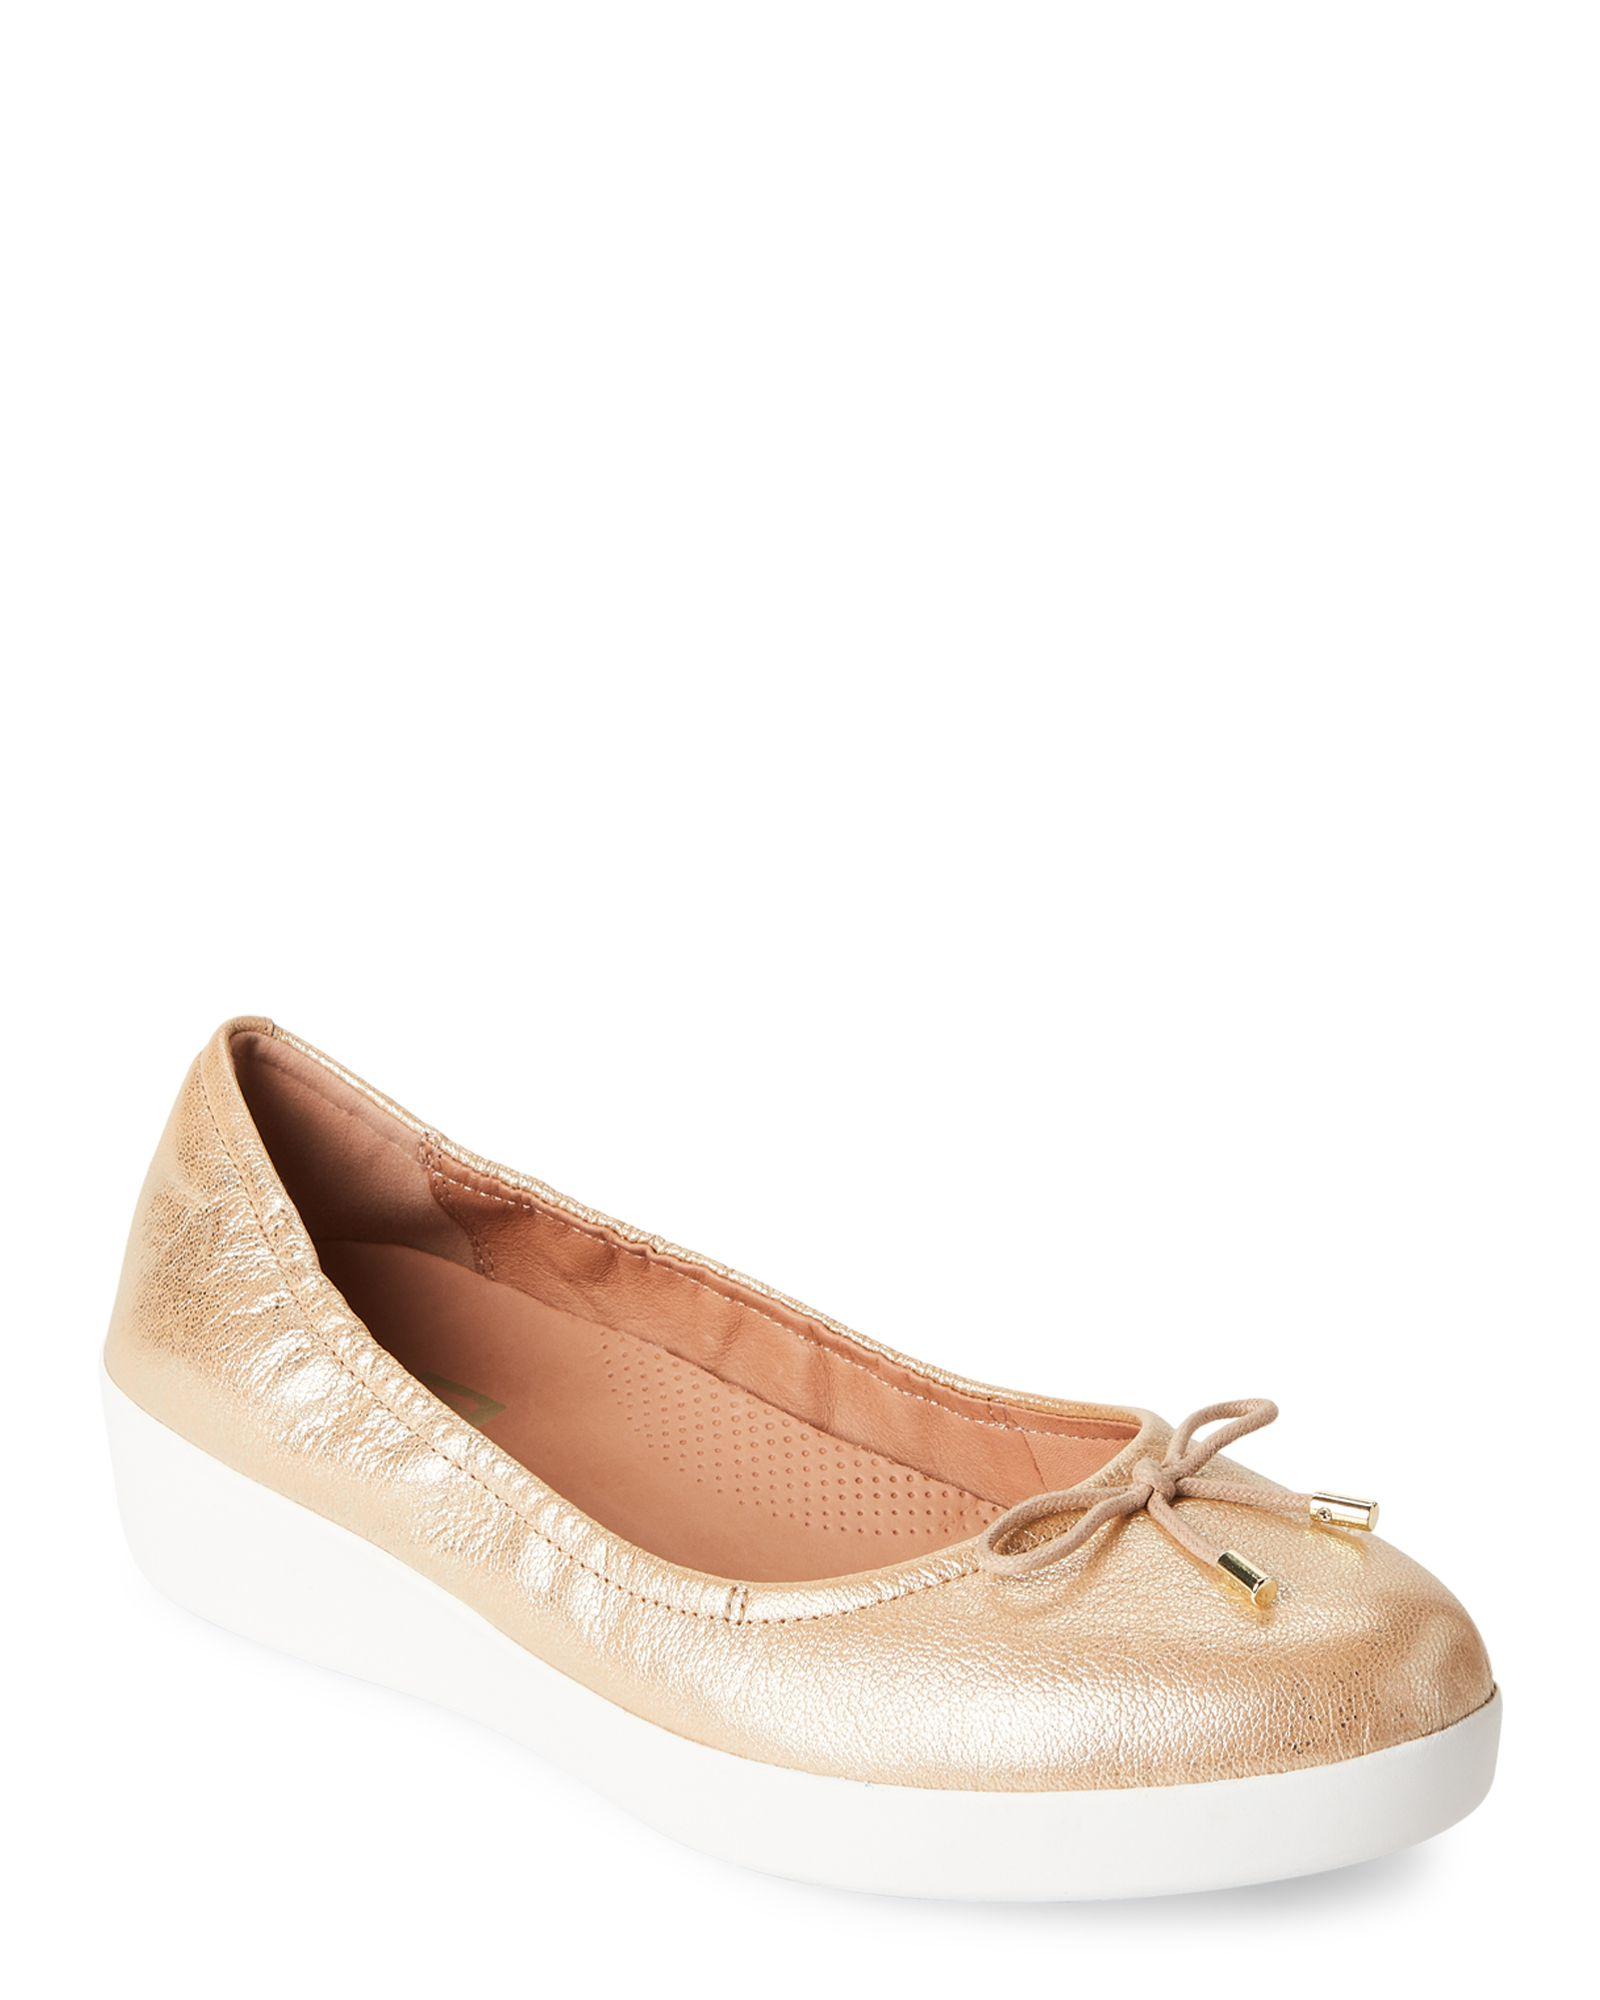 545e765bf7b3 Fitflop Gold Superbendy Ballerina Demi Wedge Flats